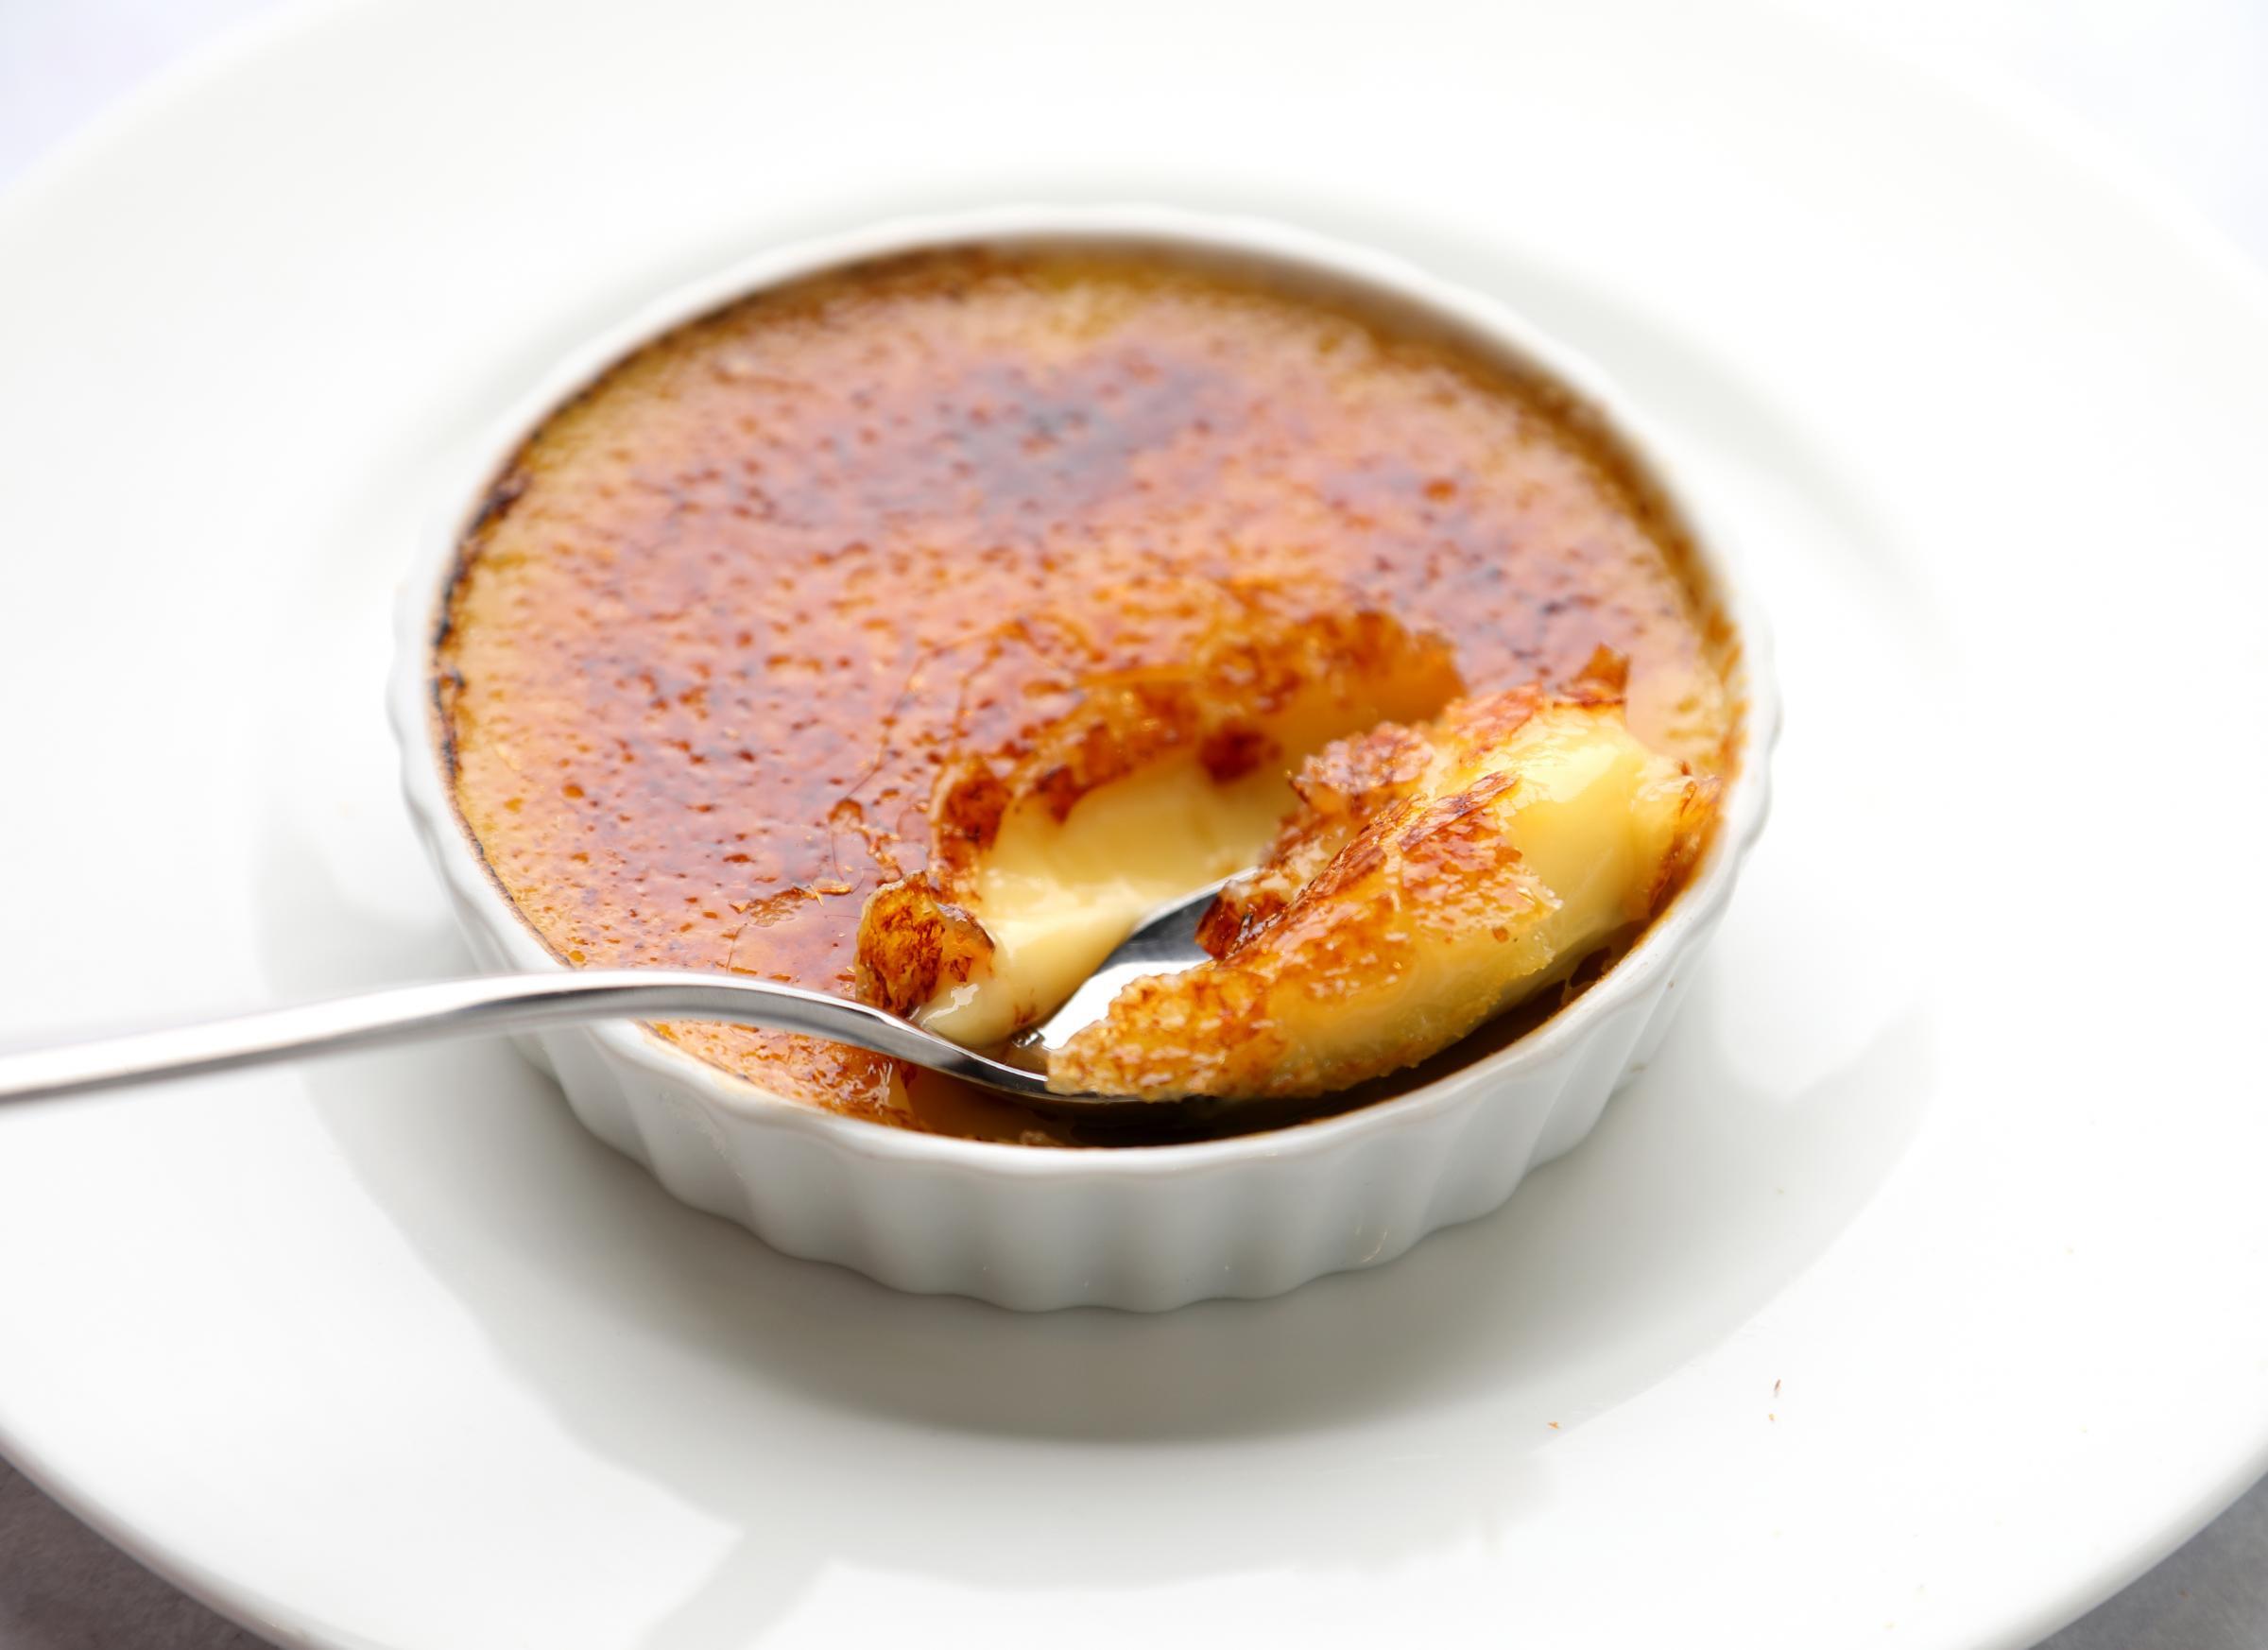 Chef Brian Maule's Vanilla flavoured Creme Brulee